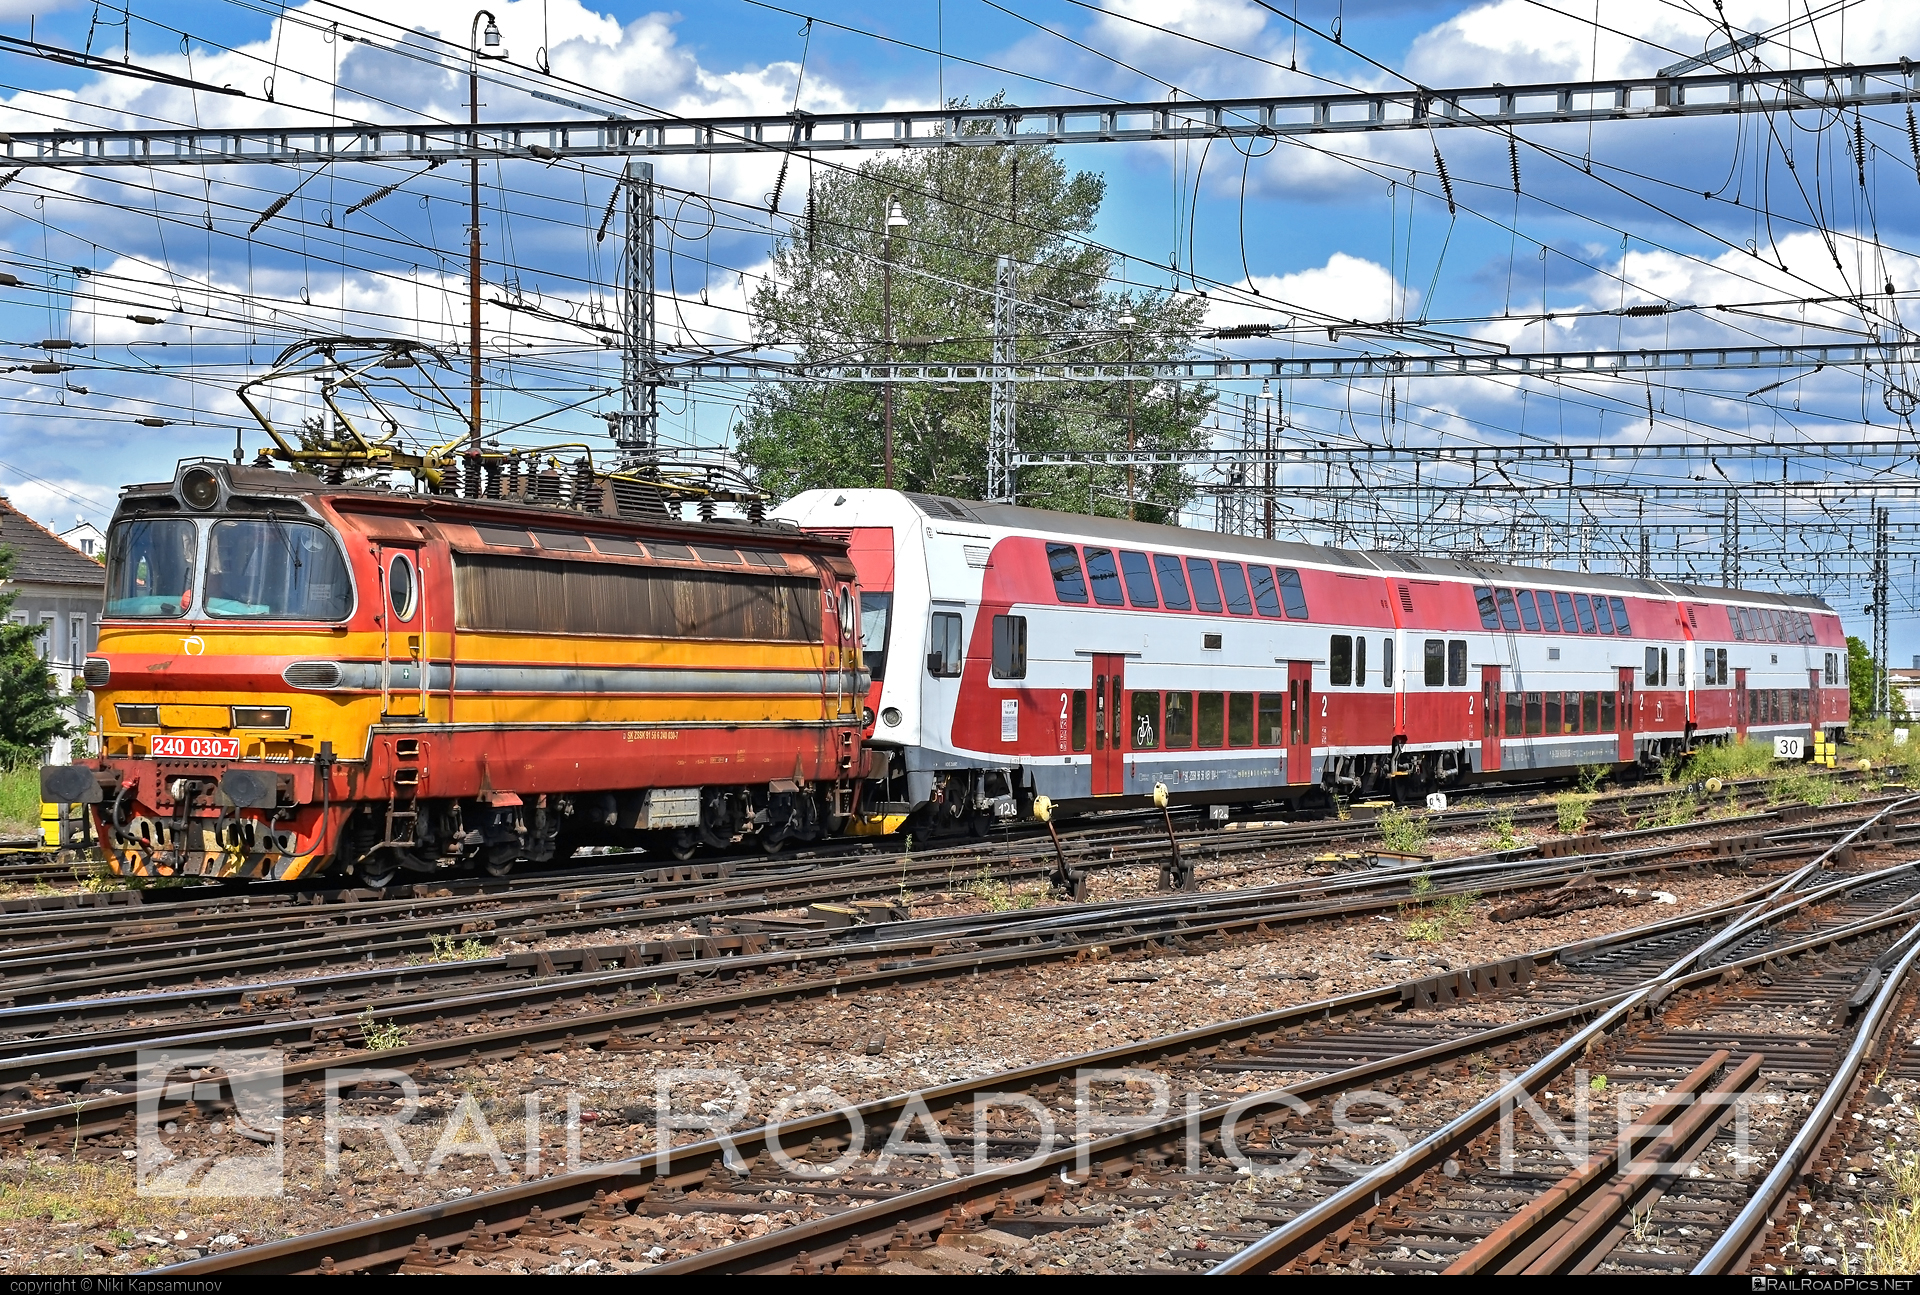 Škoda 47E - 240 030-7 operated by Železničná Spoločnost' Slovensko, a.s. #ZeleznicnaSpolocnostSlovensko #laminatka #locomotive240 #skoda #skoda47e #zssk